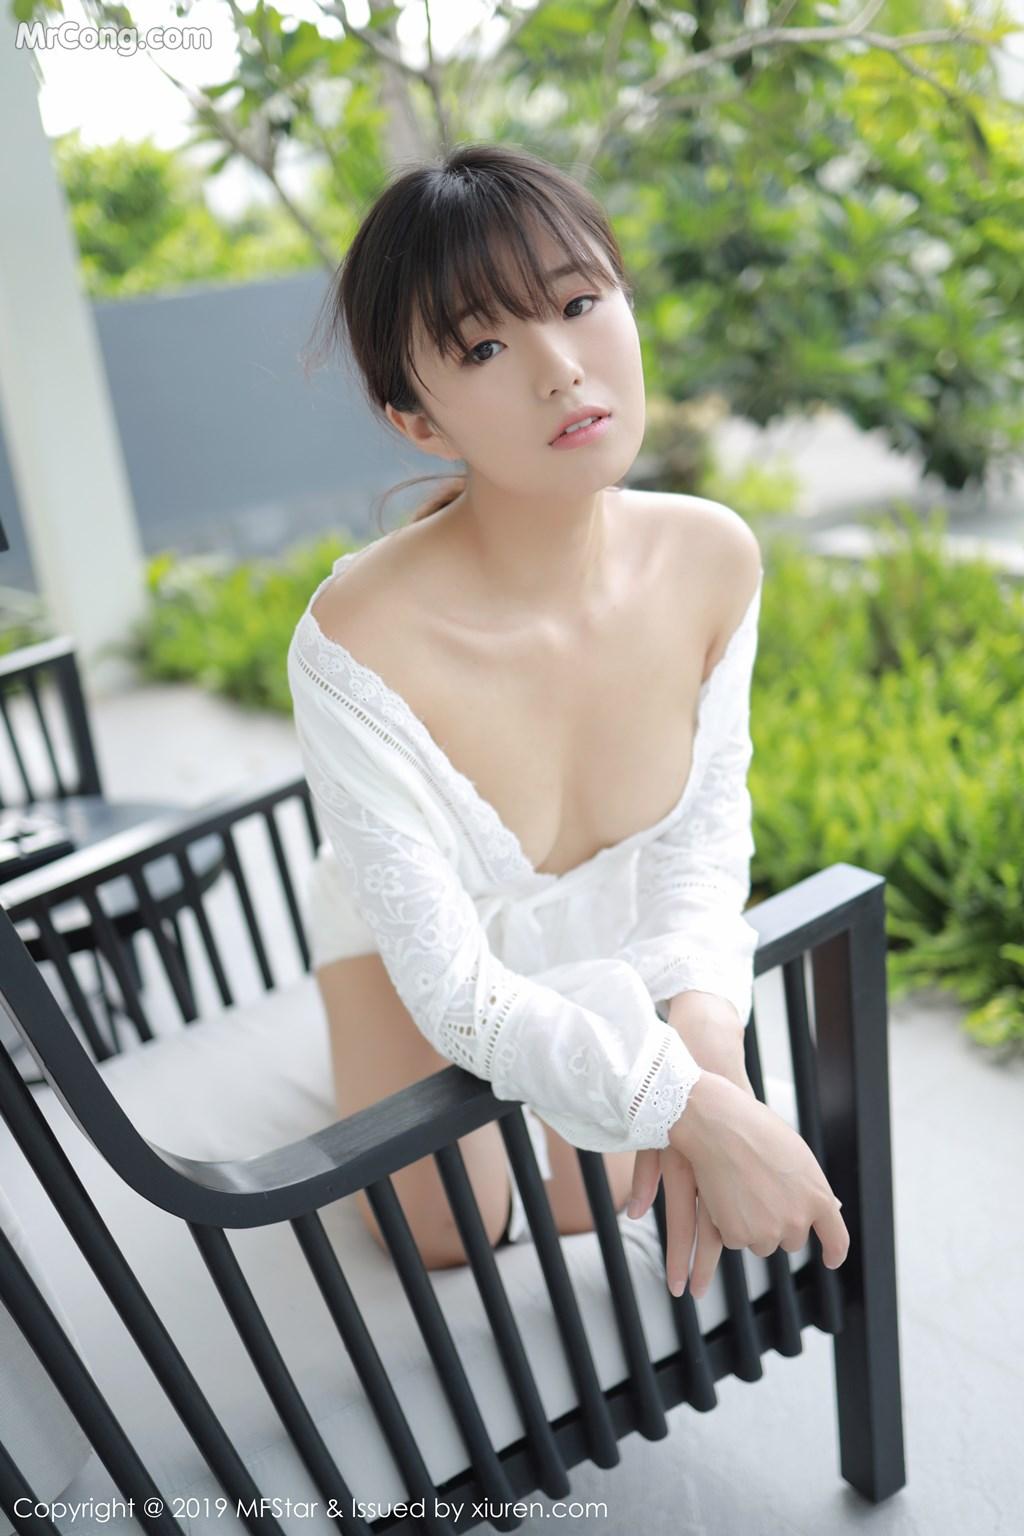 Image MFStar-Vol.192-Cang-Jing-You-Xiang-MrCong.com-007 in post MFStar Vol.192: Cang Jing You Xiang (仓井优香) (41 ảnh)